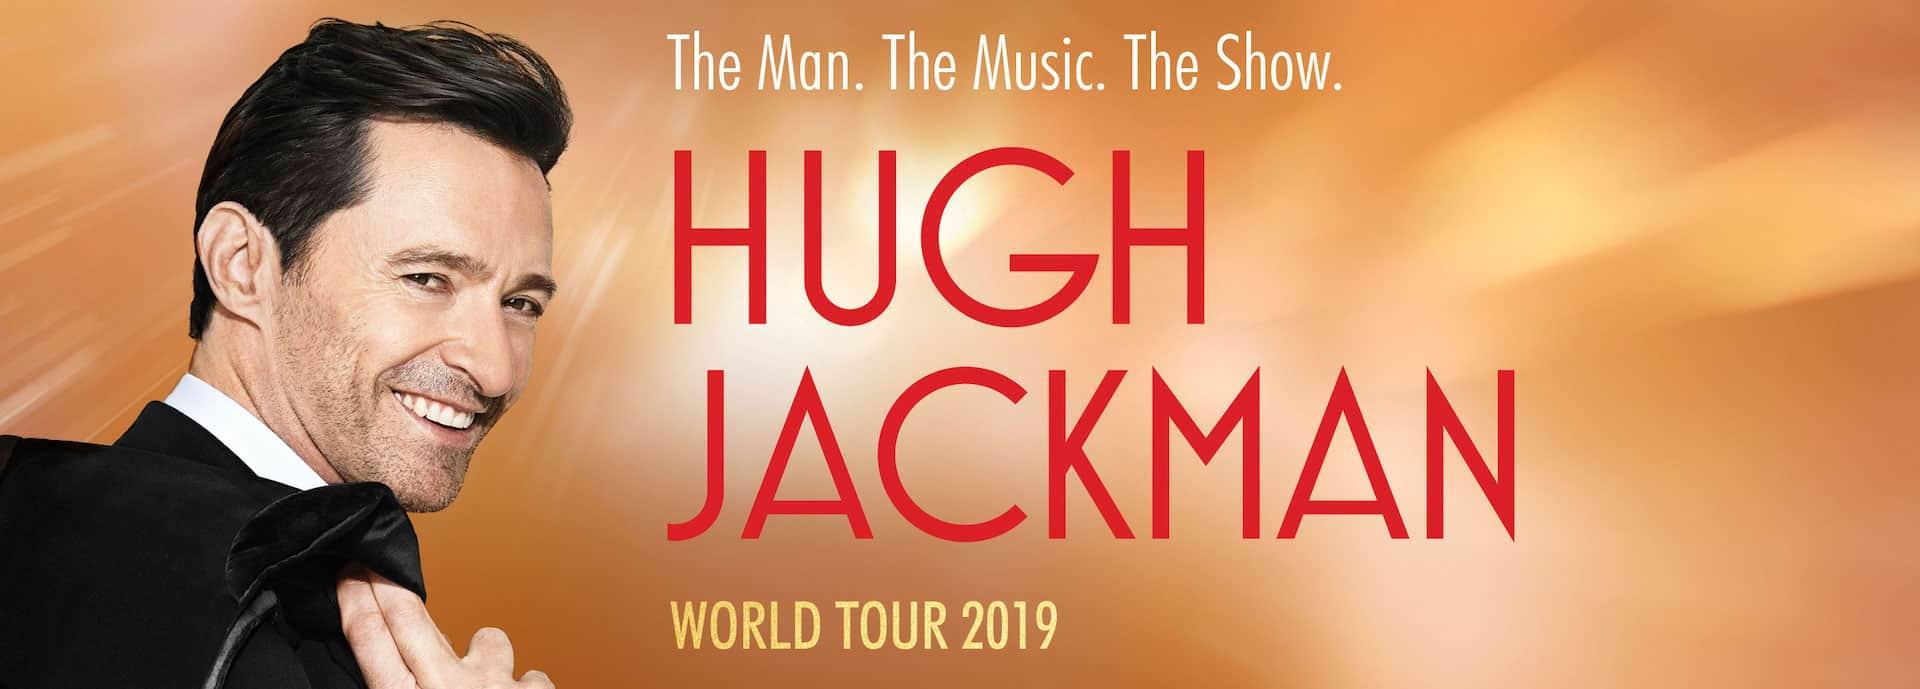 Hugh Jackman show setlist